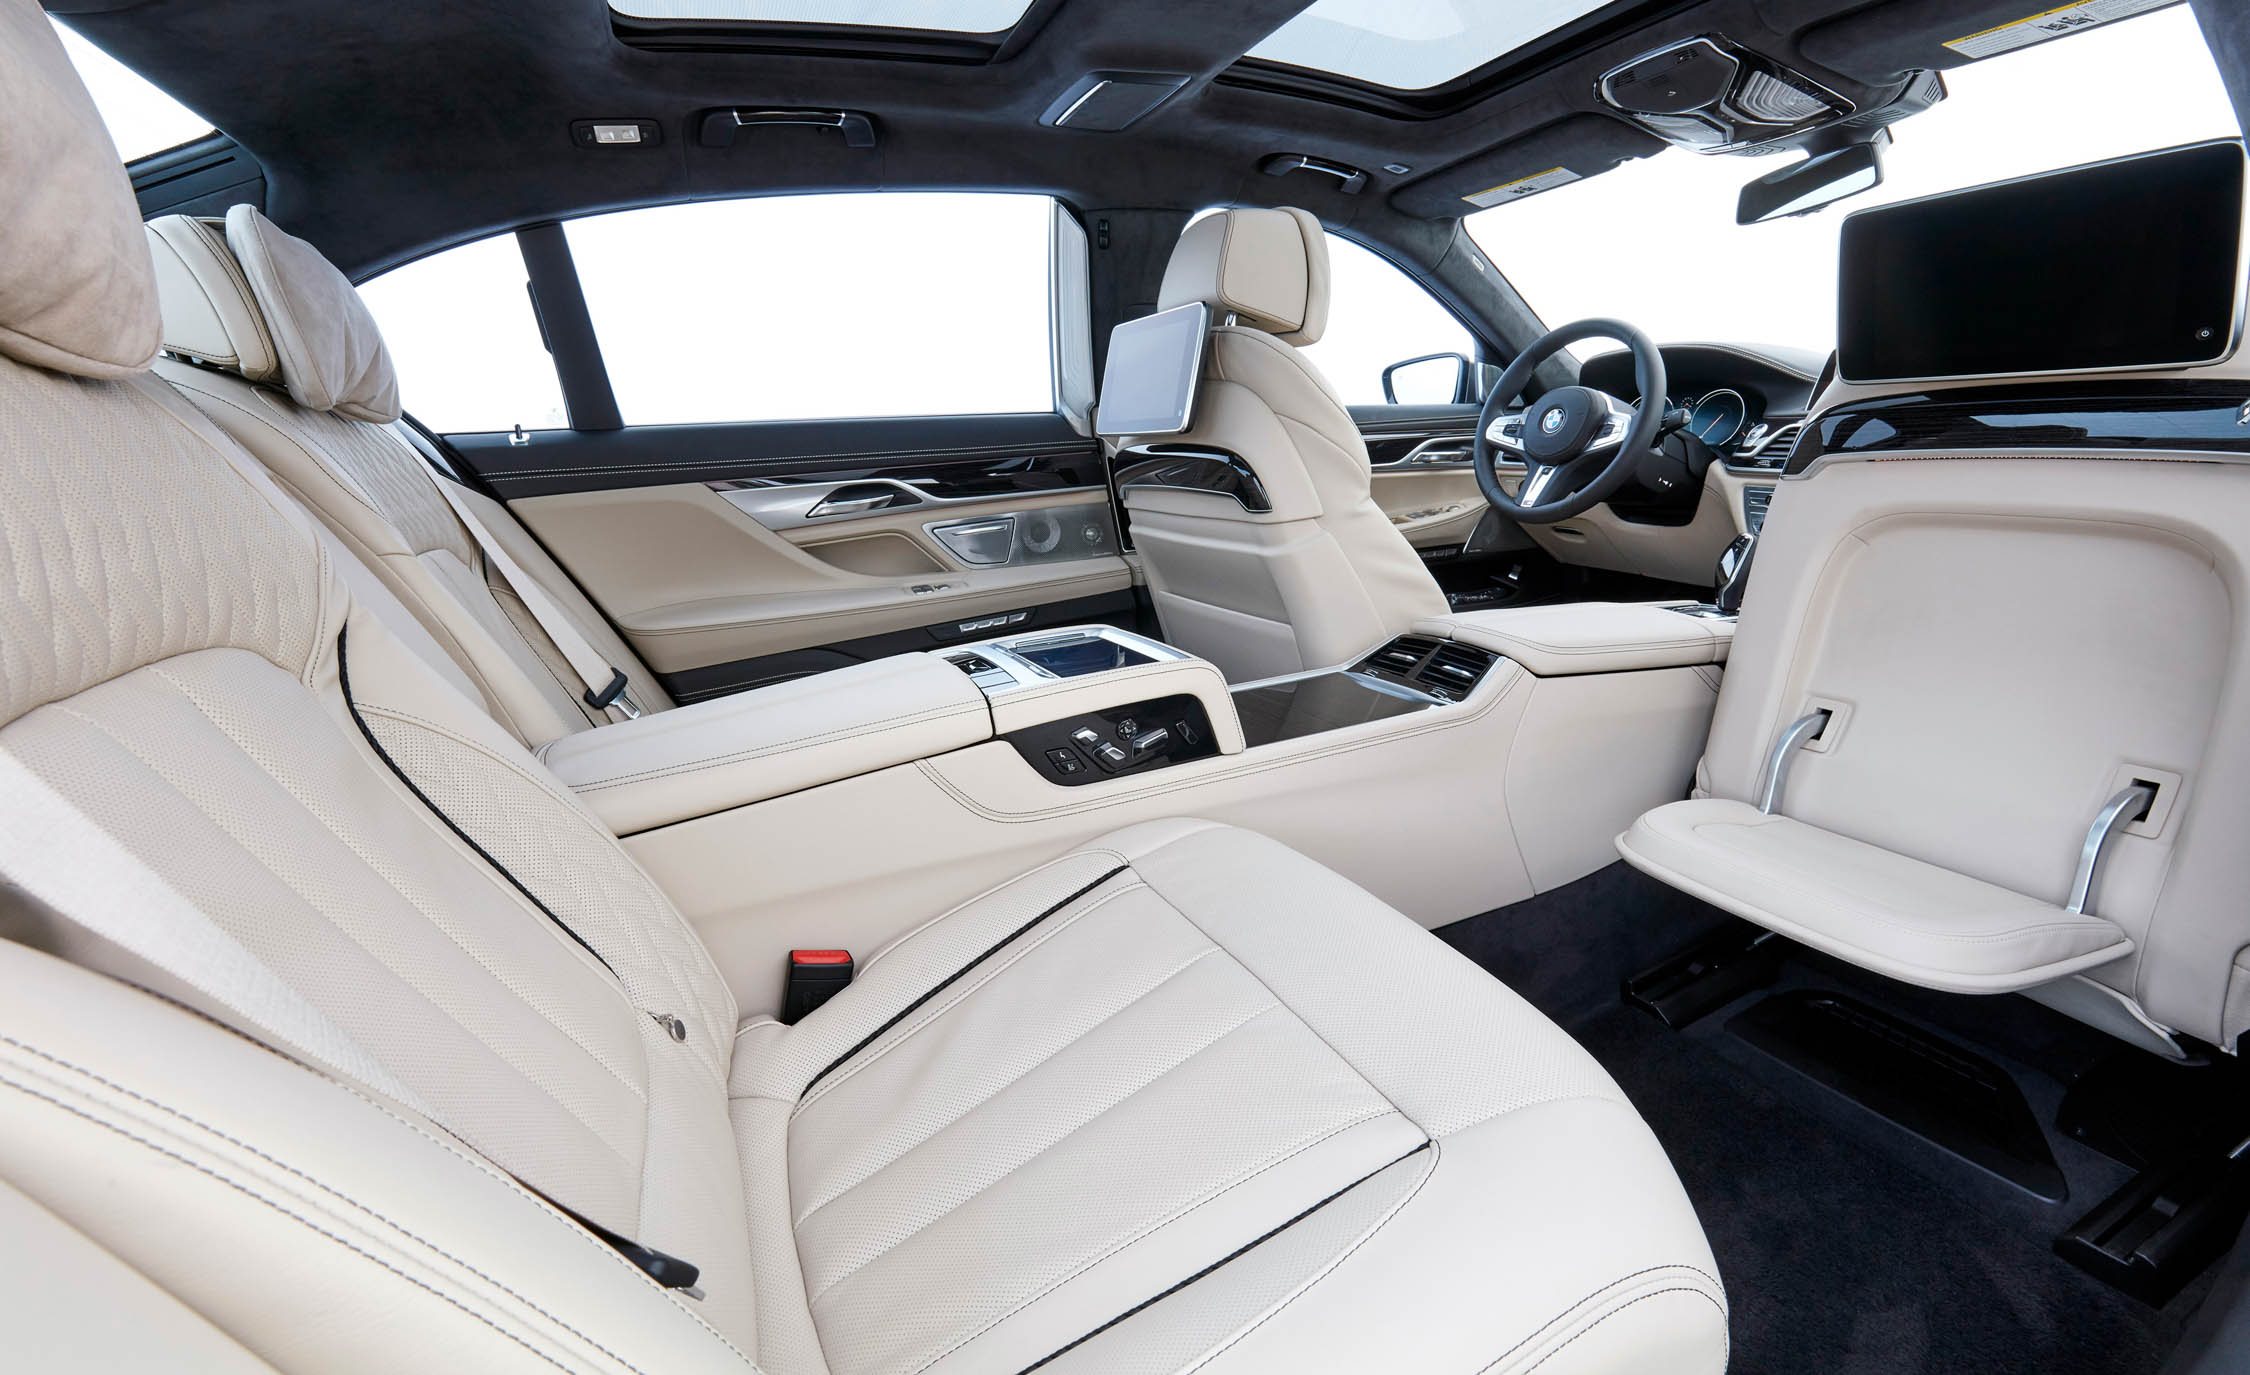 2017 BMW M760Li XDrive Interior Seats Rear (View 74 of 76)